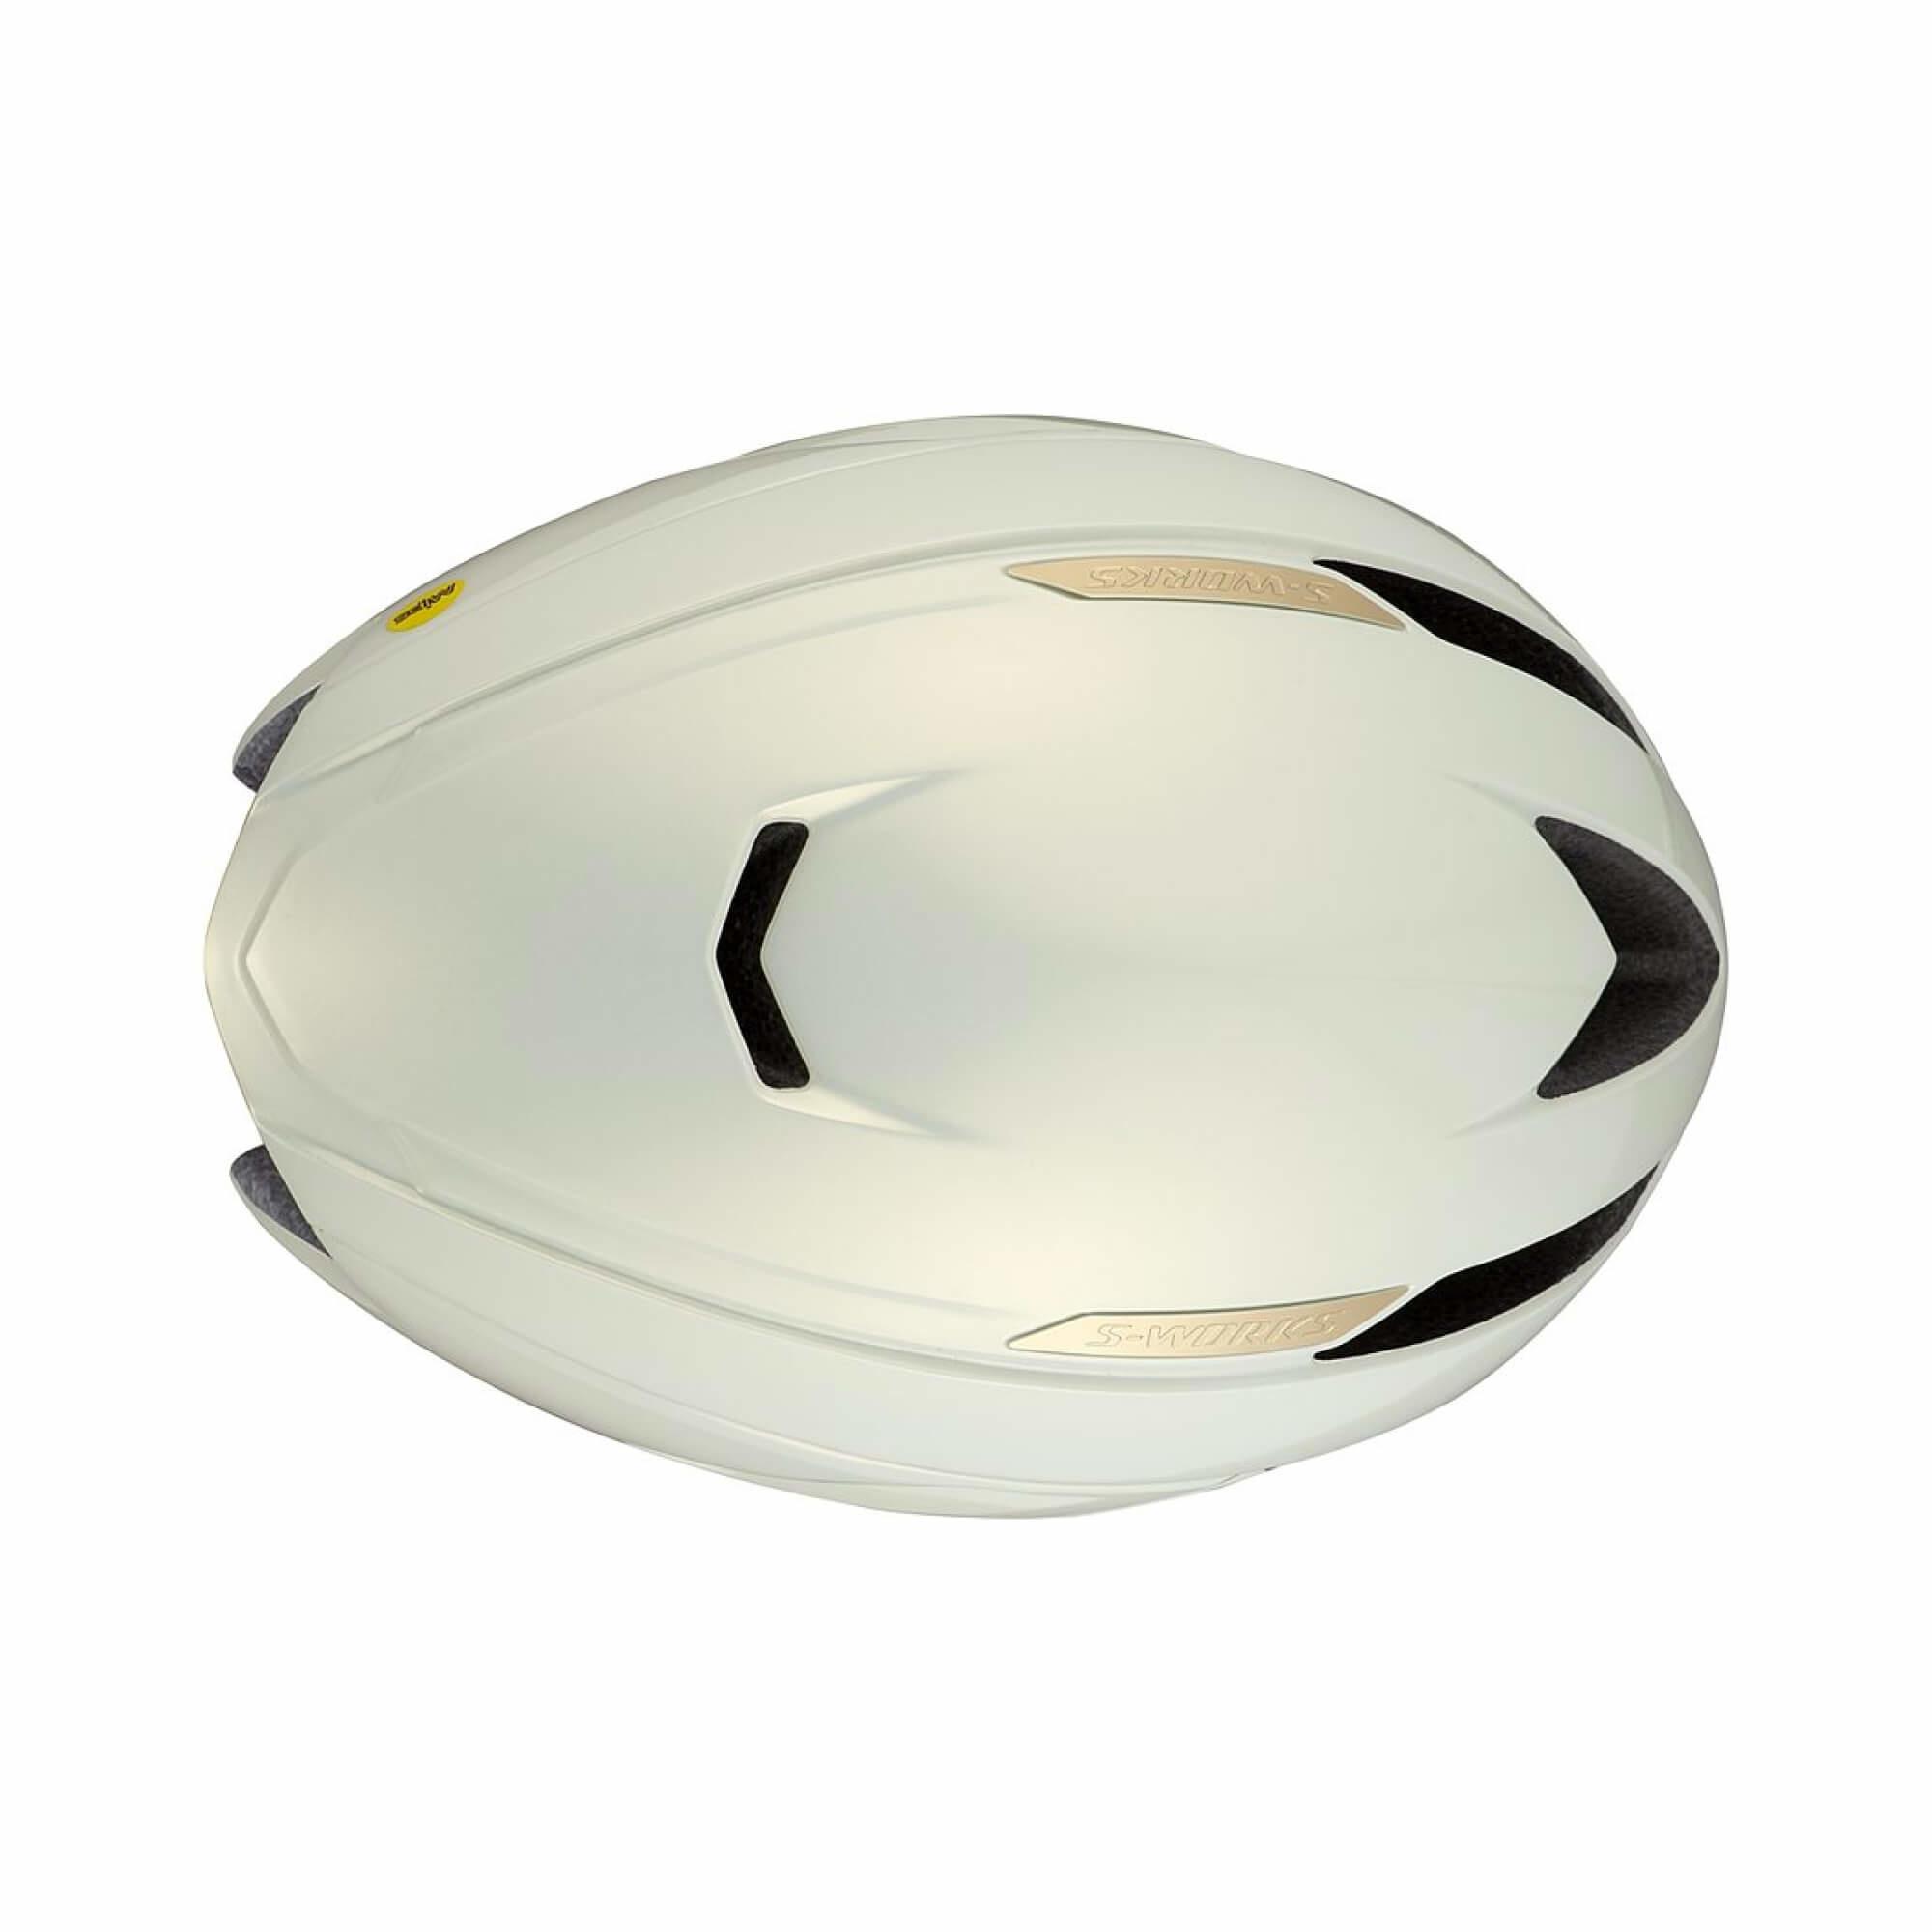 S-Works Evade II Helmet Angi Mips Sagan Disruption 2022-6